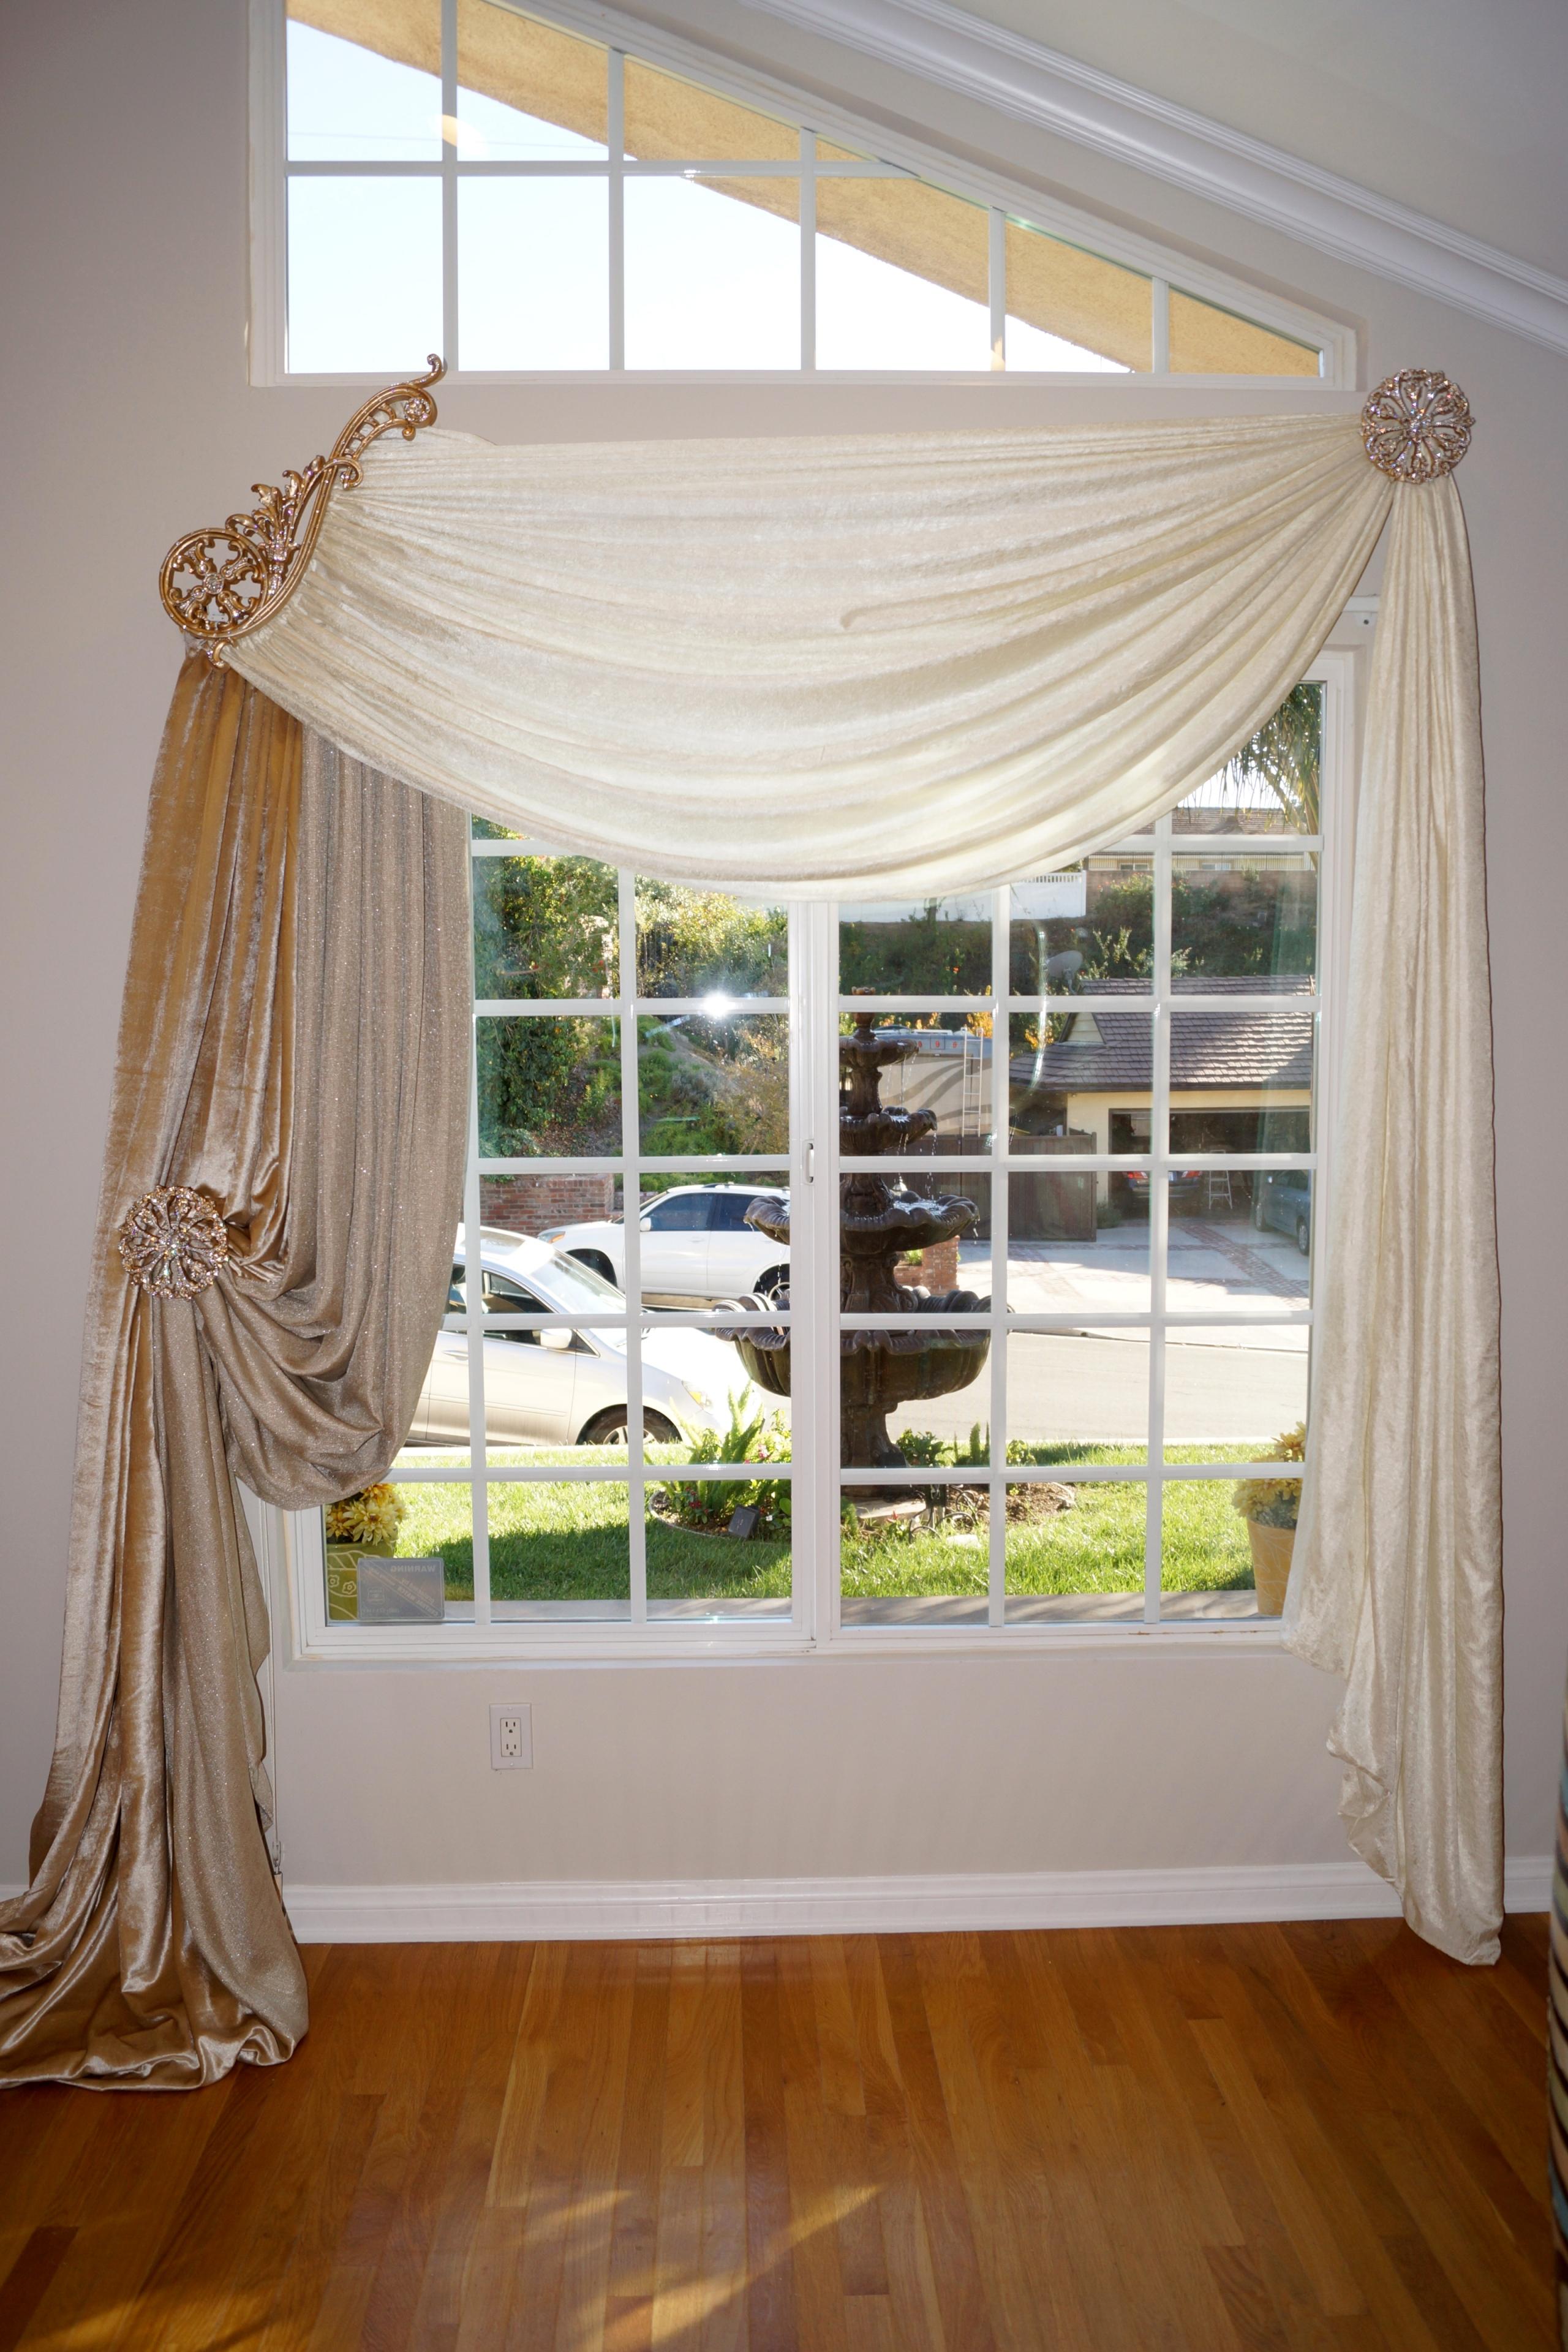 Design Window: Galaxy-Design Introduces Luxurious Custom Window